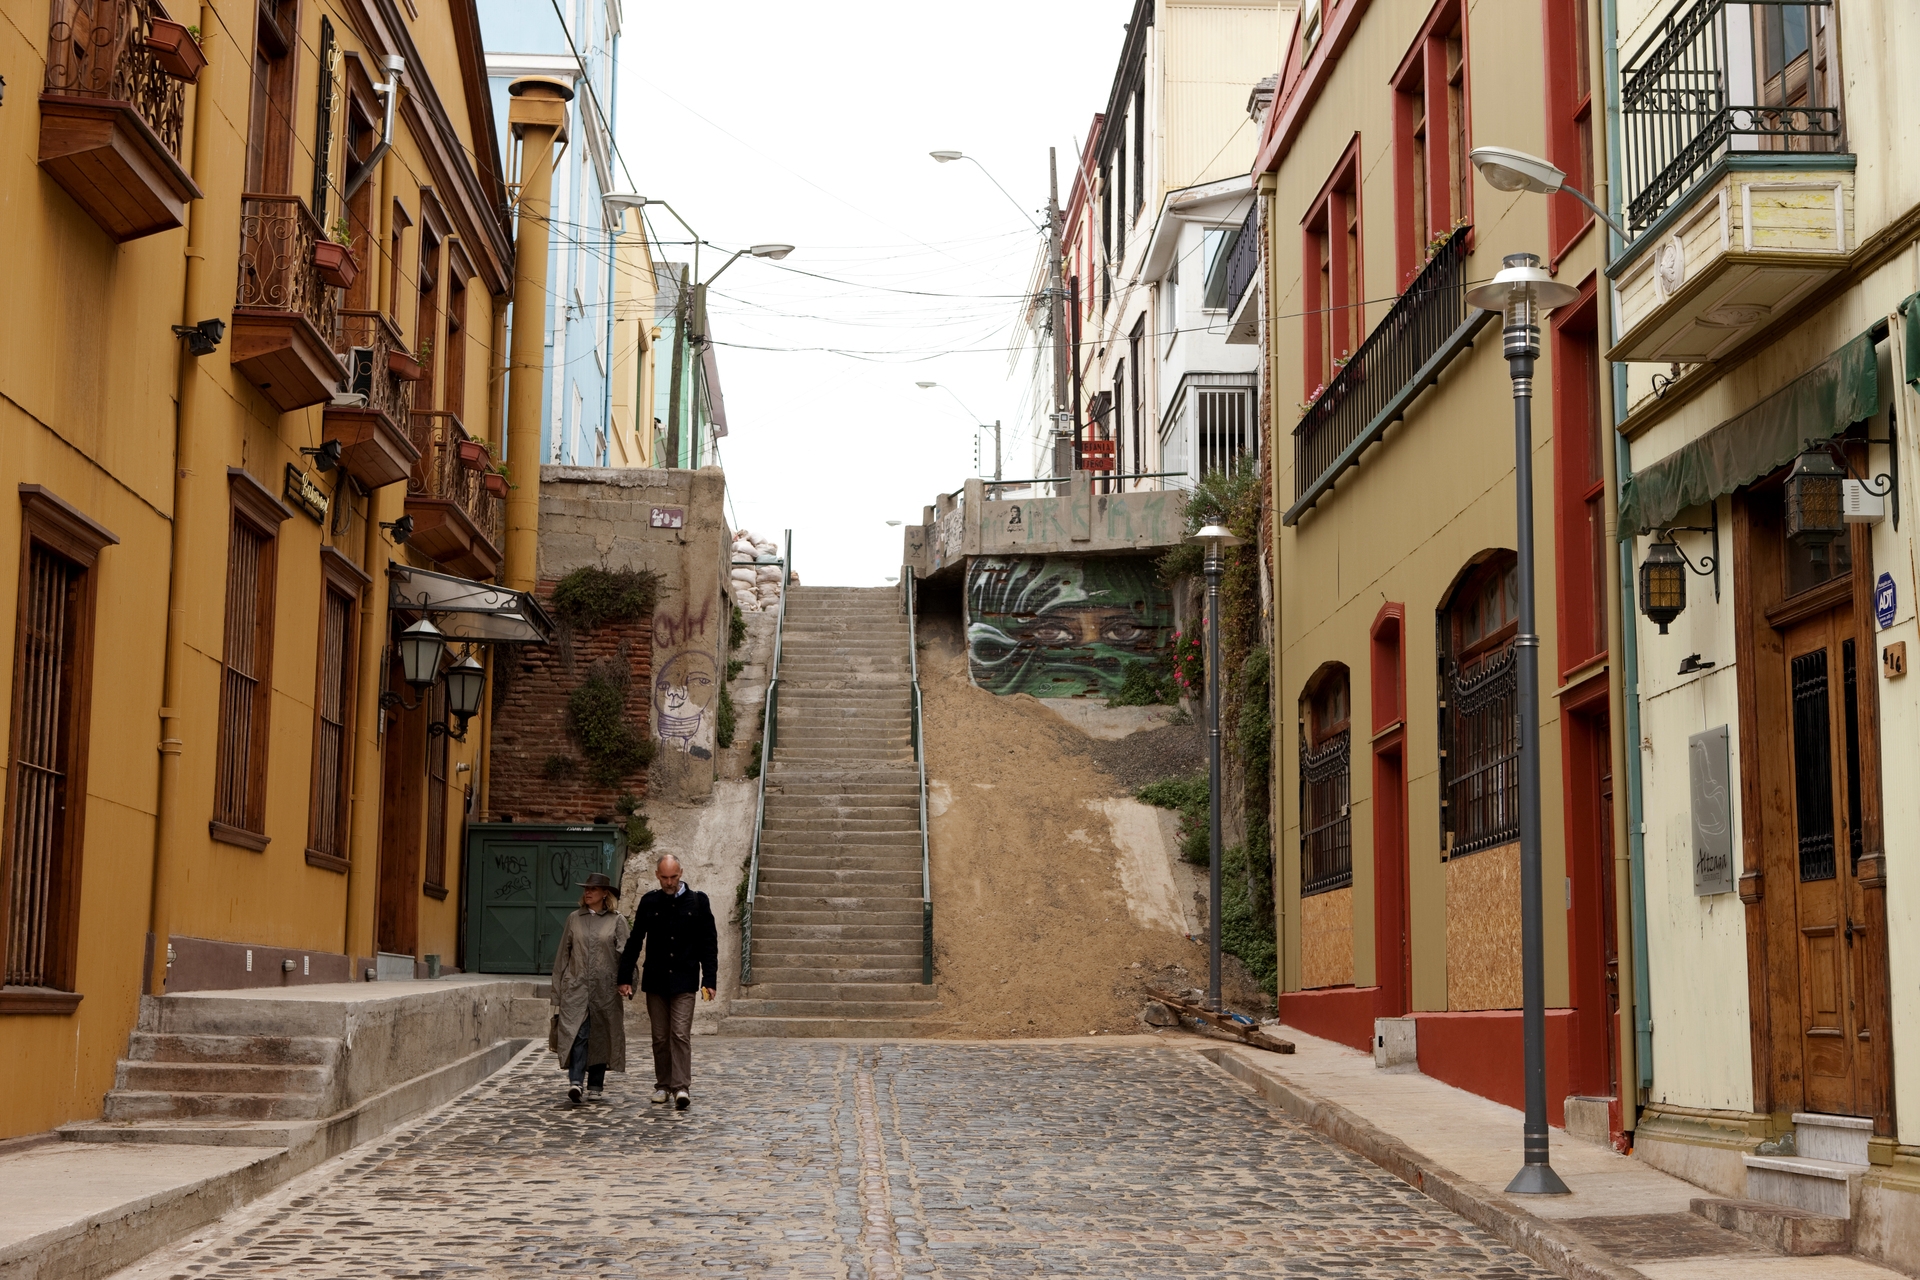 Valparaíso, declarada Patrimônio da Humanidade pela Unesco